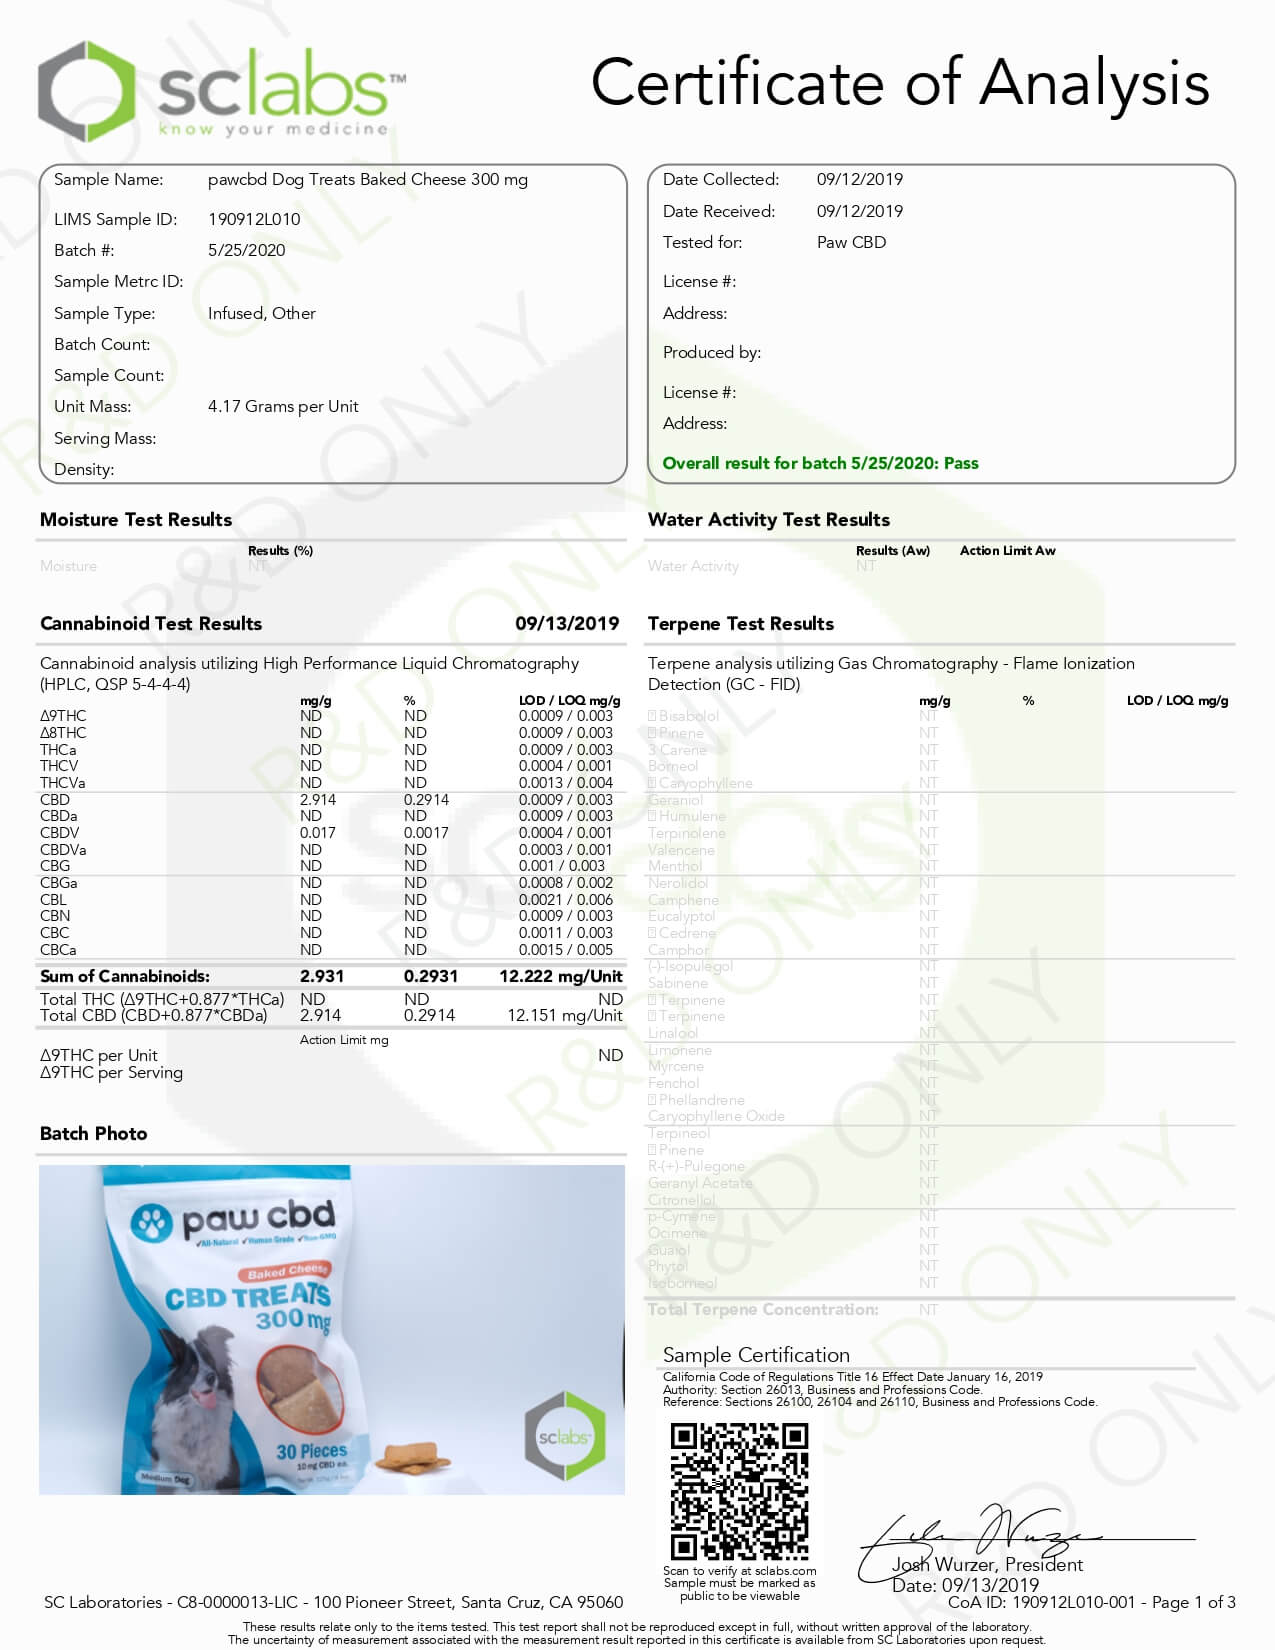 cbdMD CBD Pet Edible Baked Cheese Dog Treats 300mg Lab Report